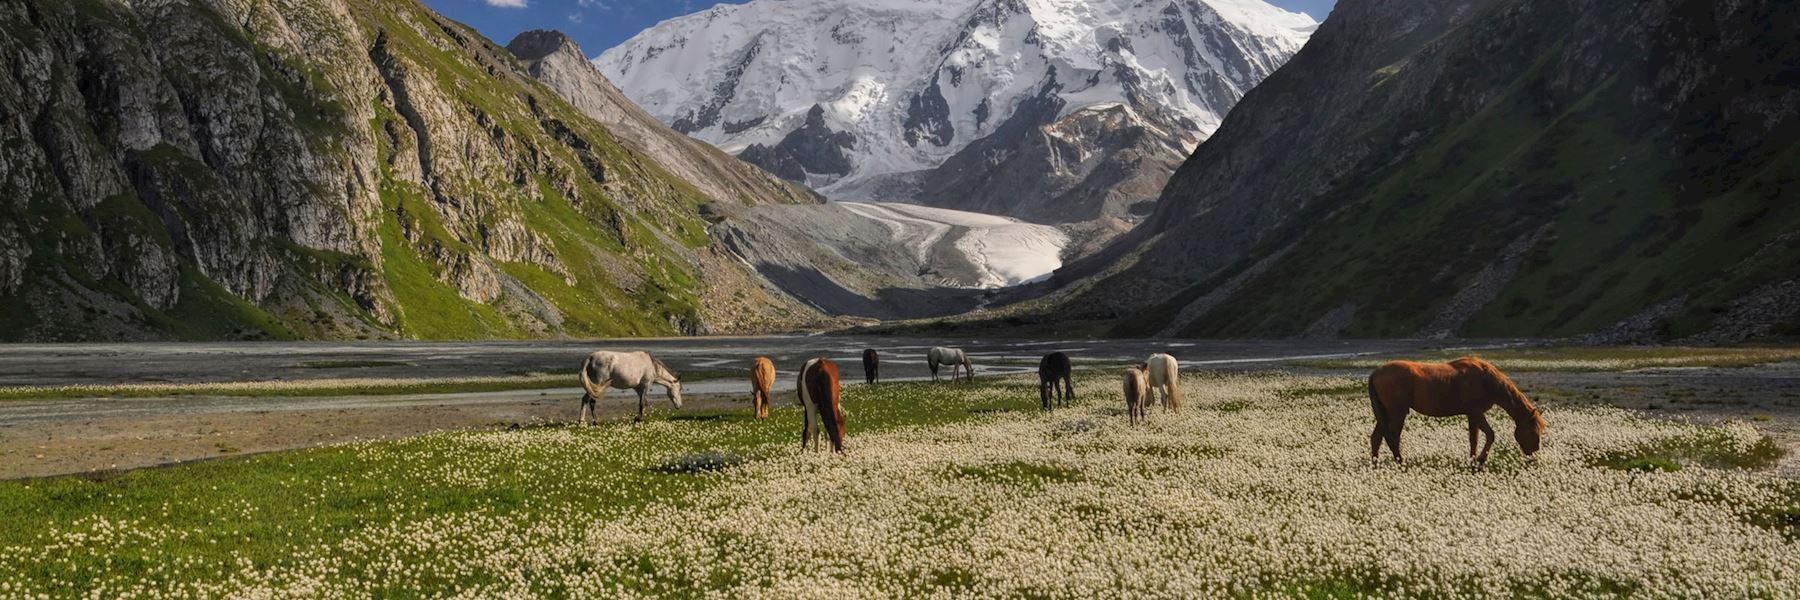 Kyrgyzstan travel guides